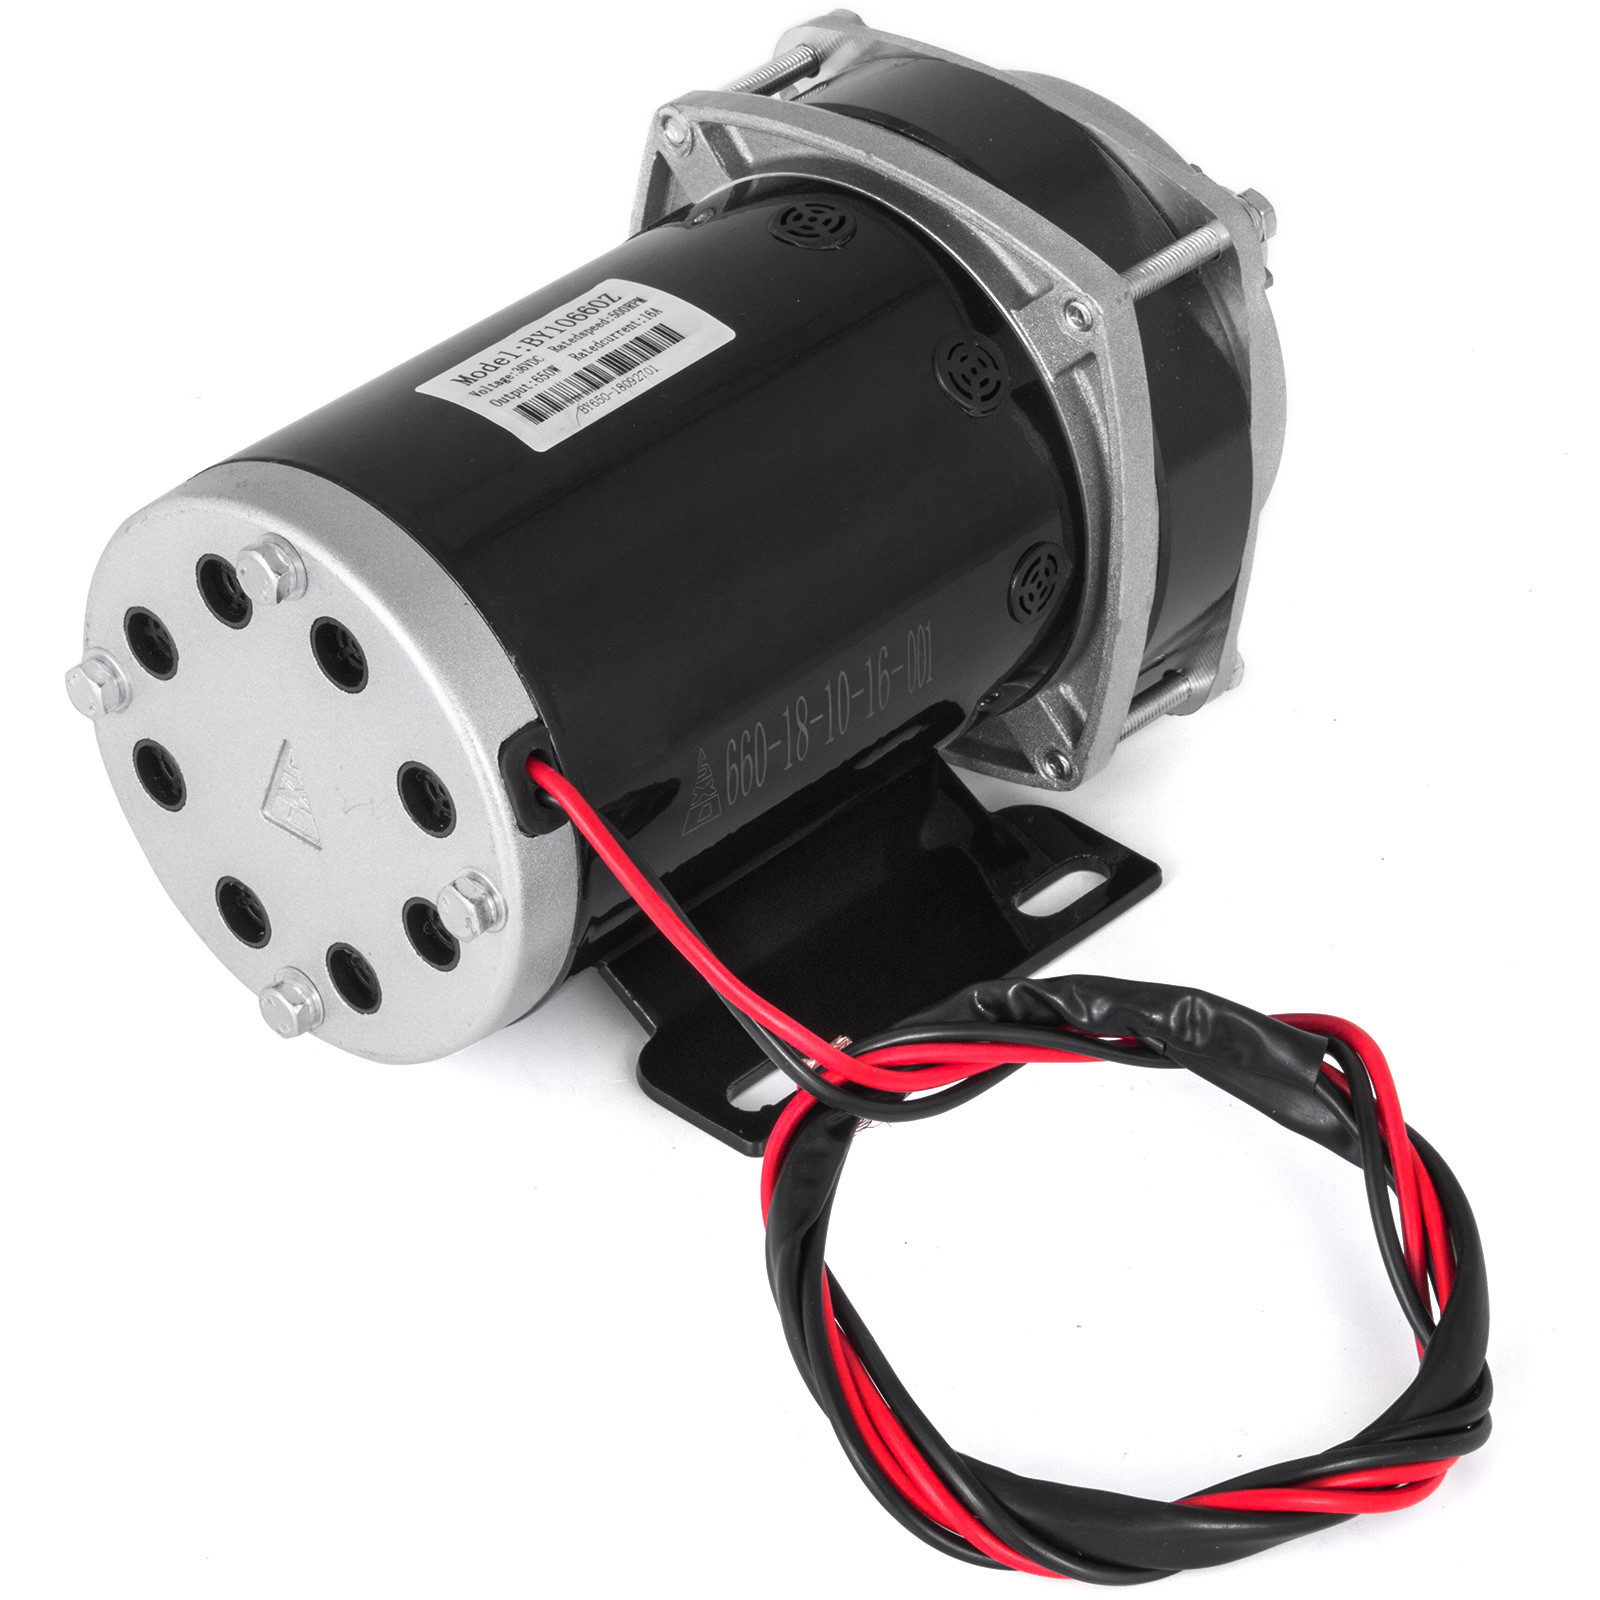 36v-Electric-Motor-controller-throttle-kit-f-Scooter-E-Scooter-ATV-Permanent thumbnail 72